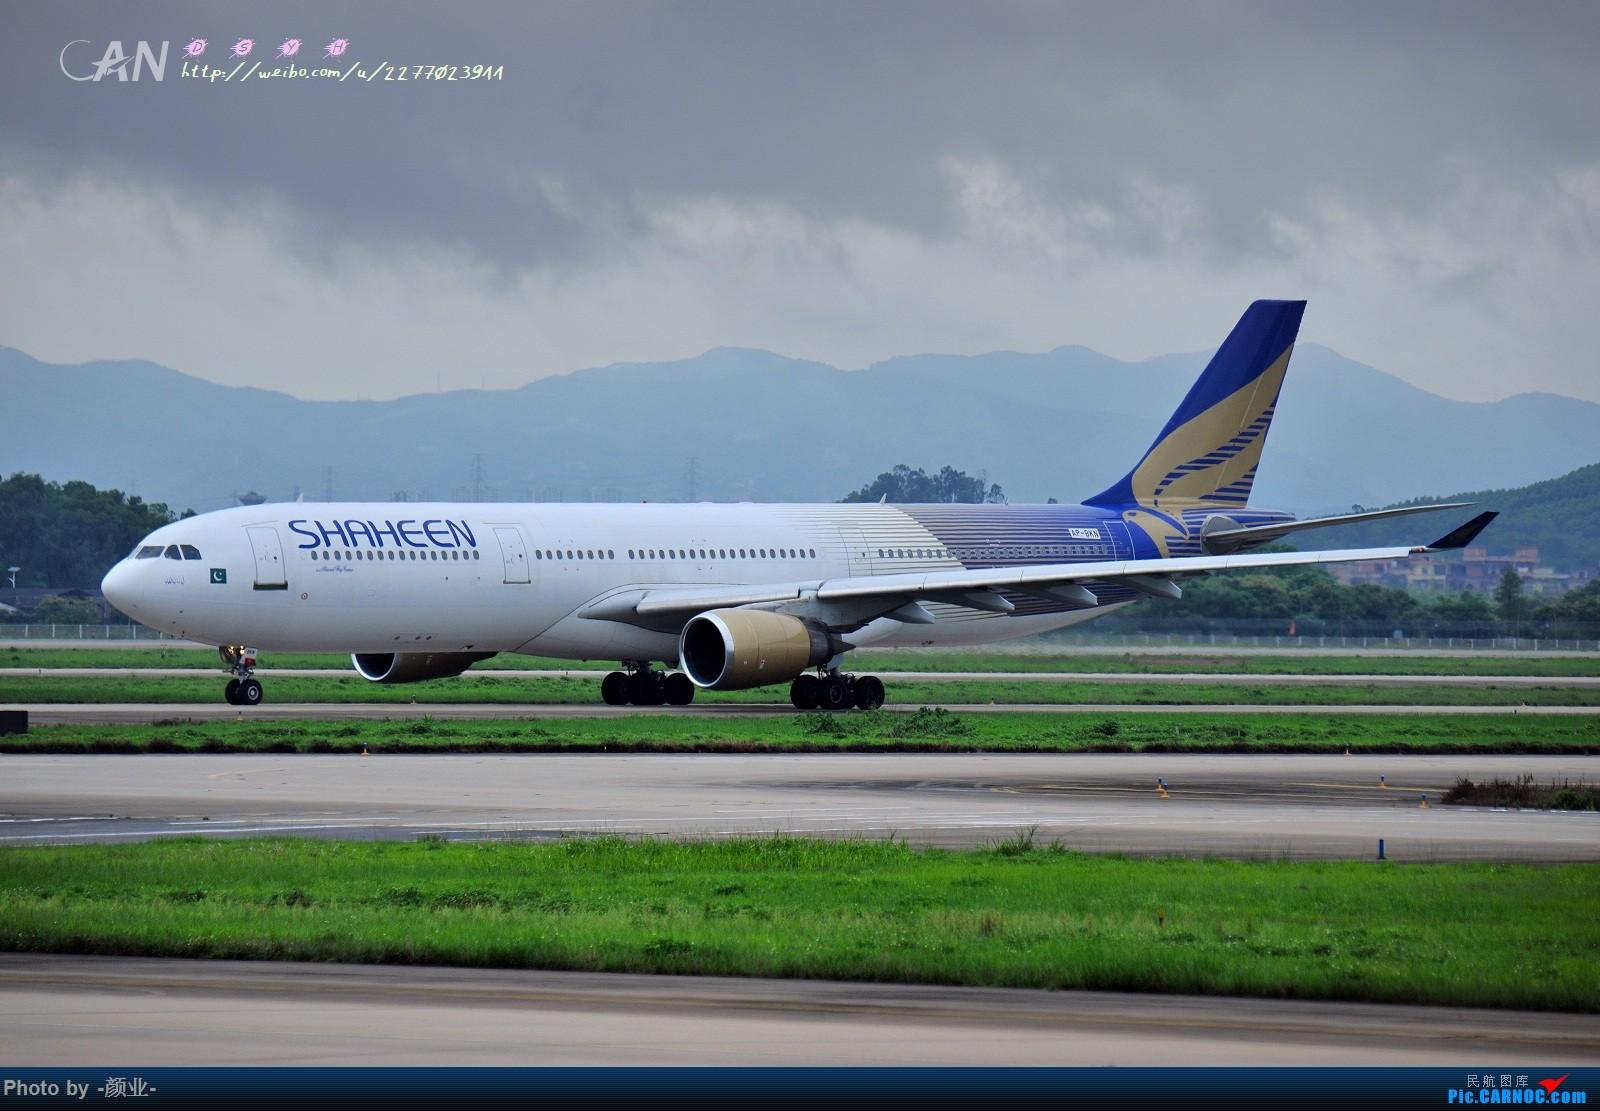 Re:[原创]2011-2016我的打灰机心情[广州] AIRBUS A330-300 AP-BKN 中国广州白云国际机场